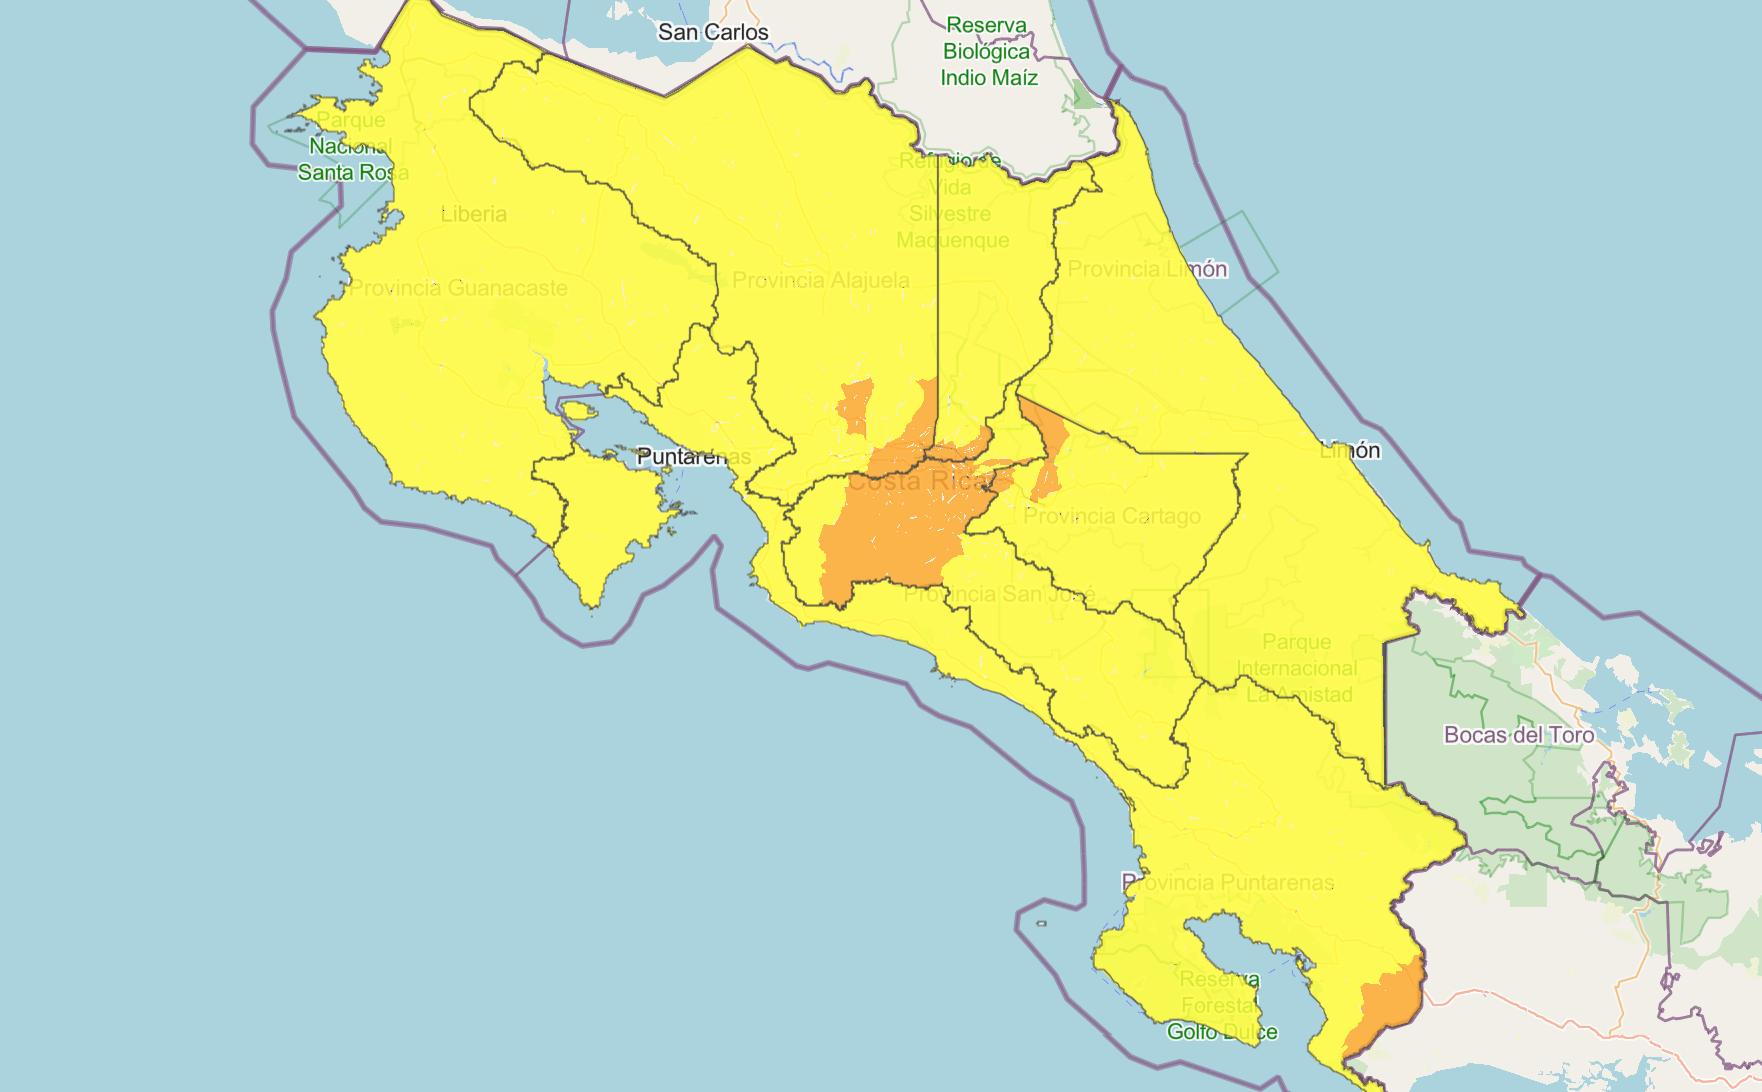 Map of Costa Rica coronavirus alert levels on Tuesday, September 1.